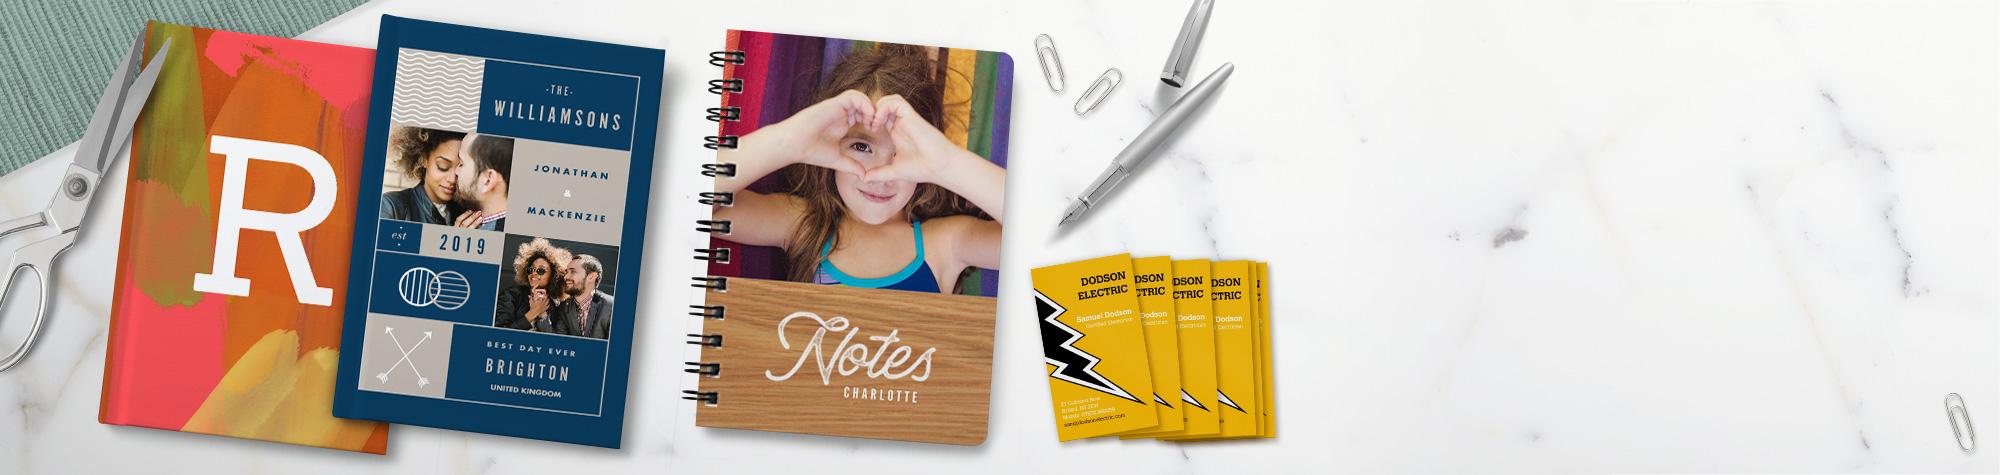 Personalised Stationery & Notebooks